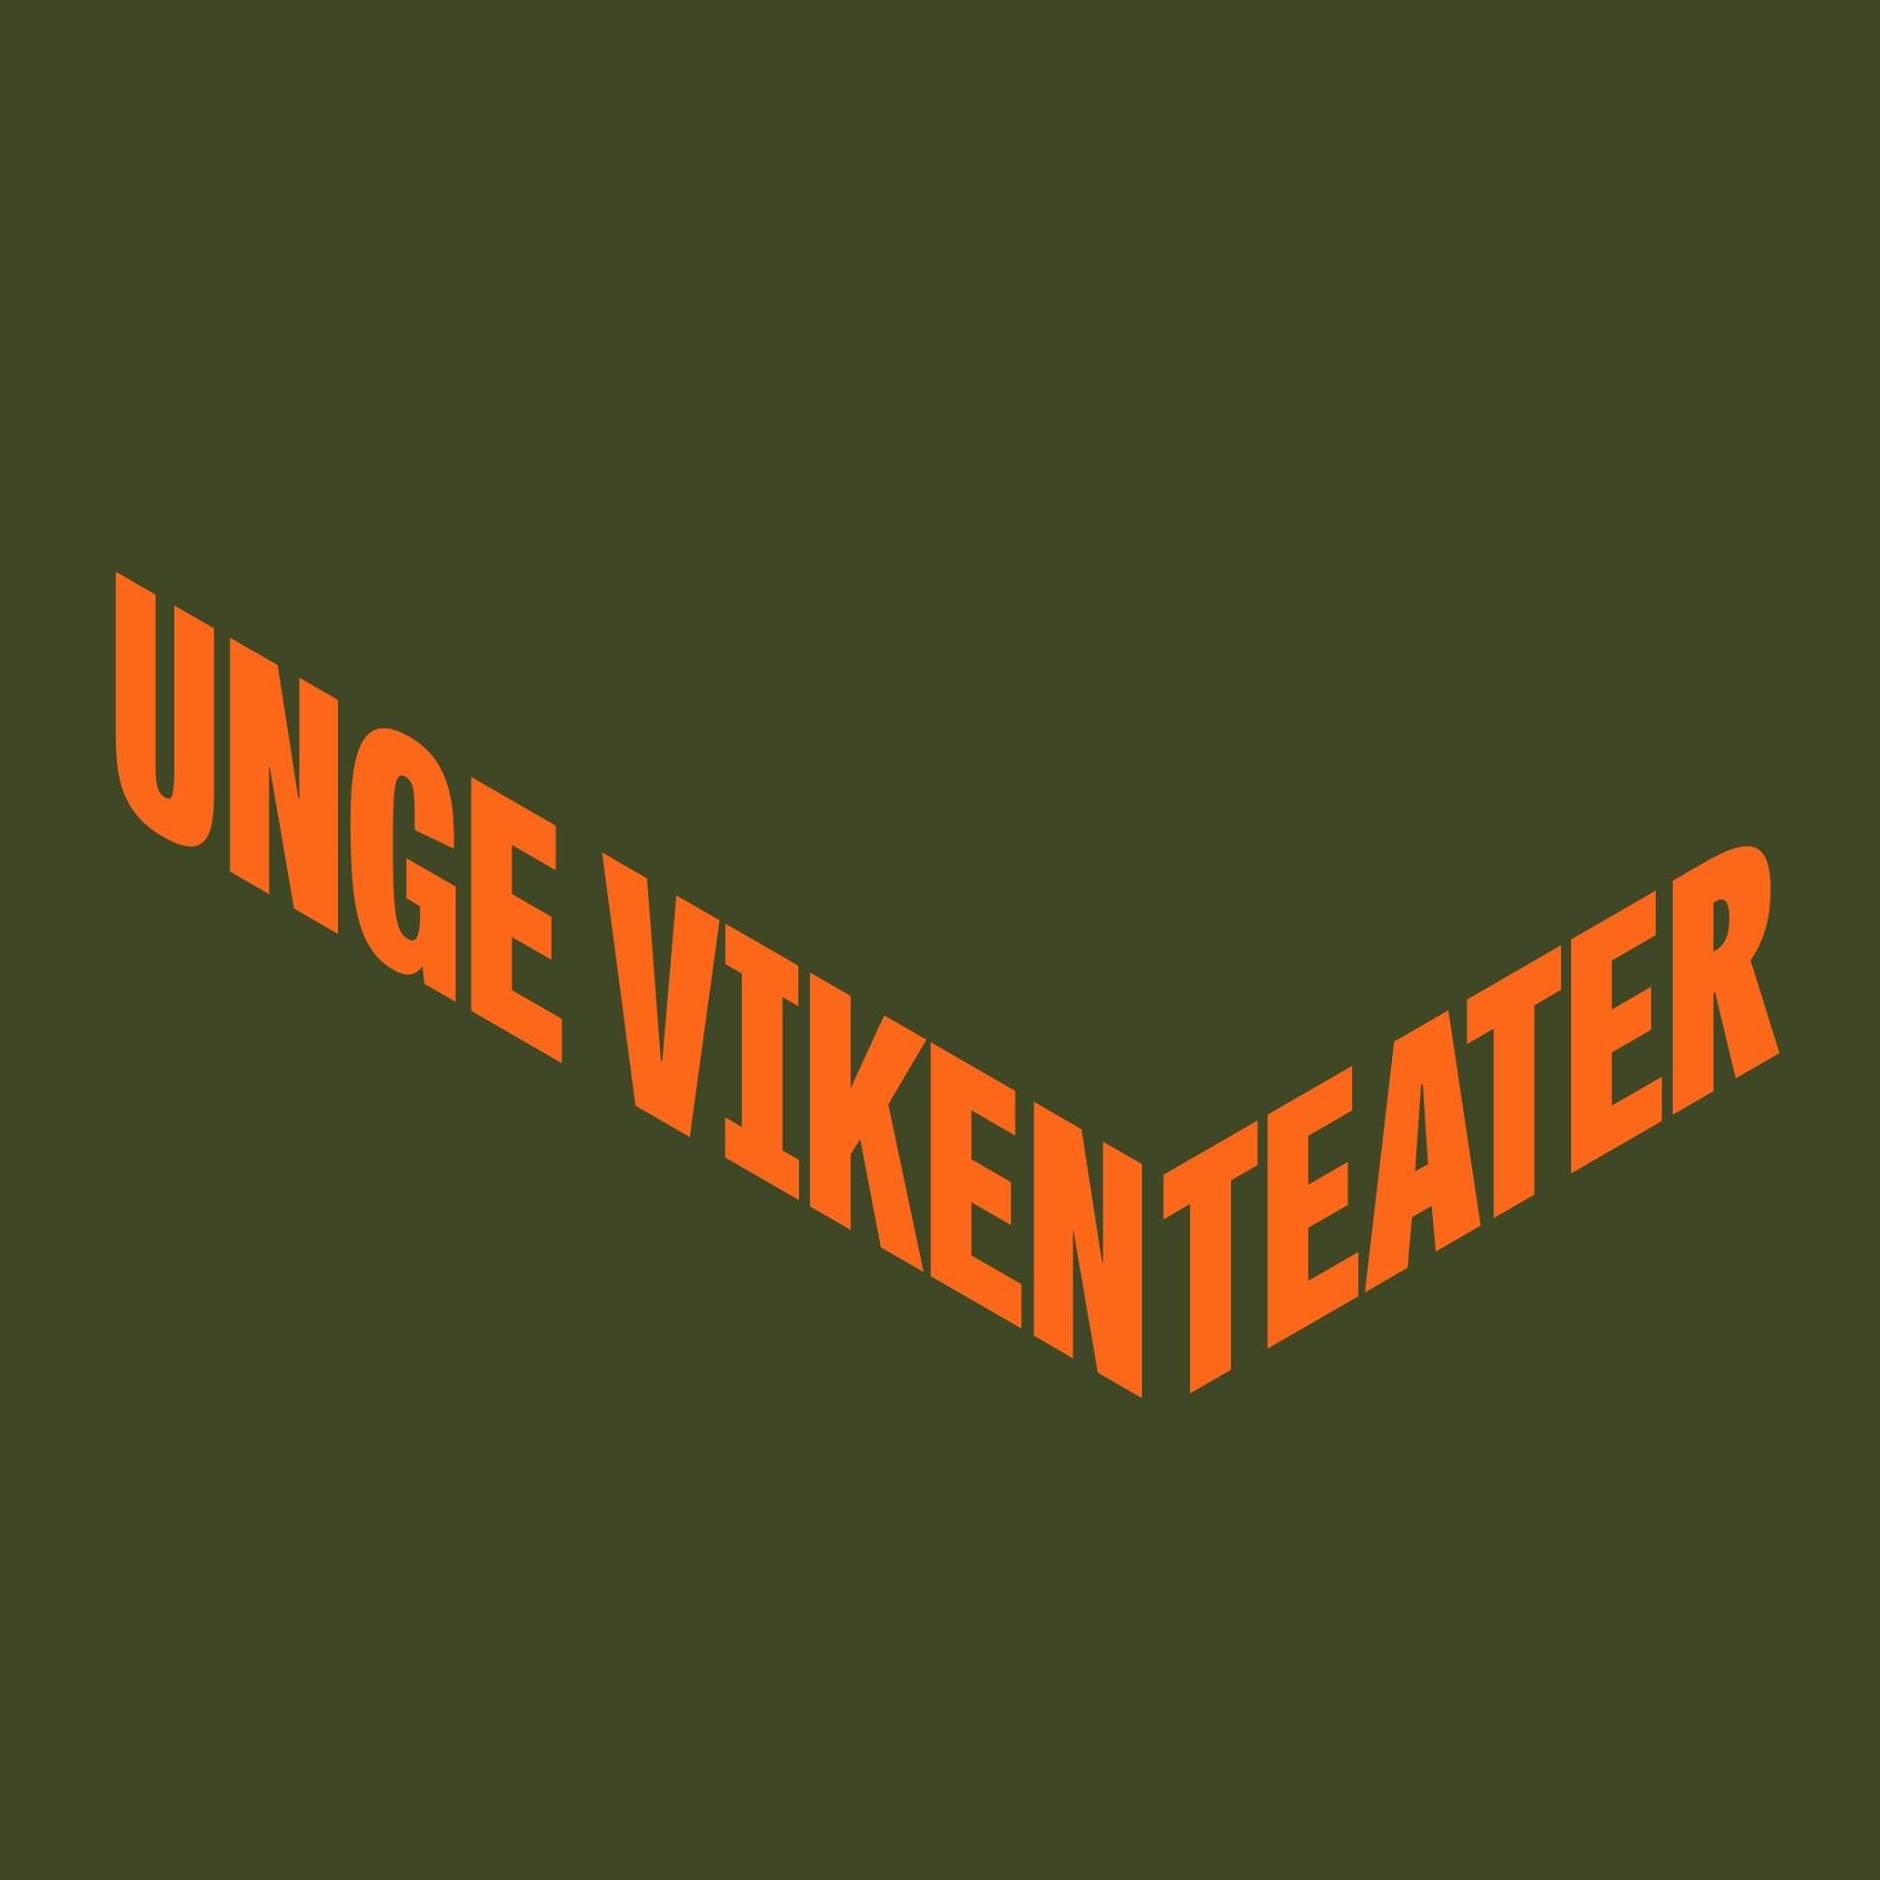 Unge Viken Teater